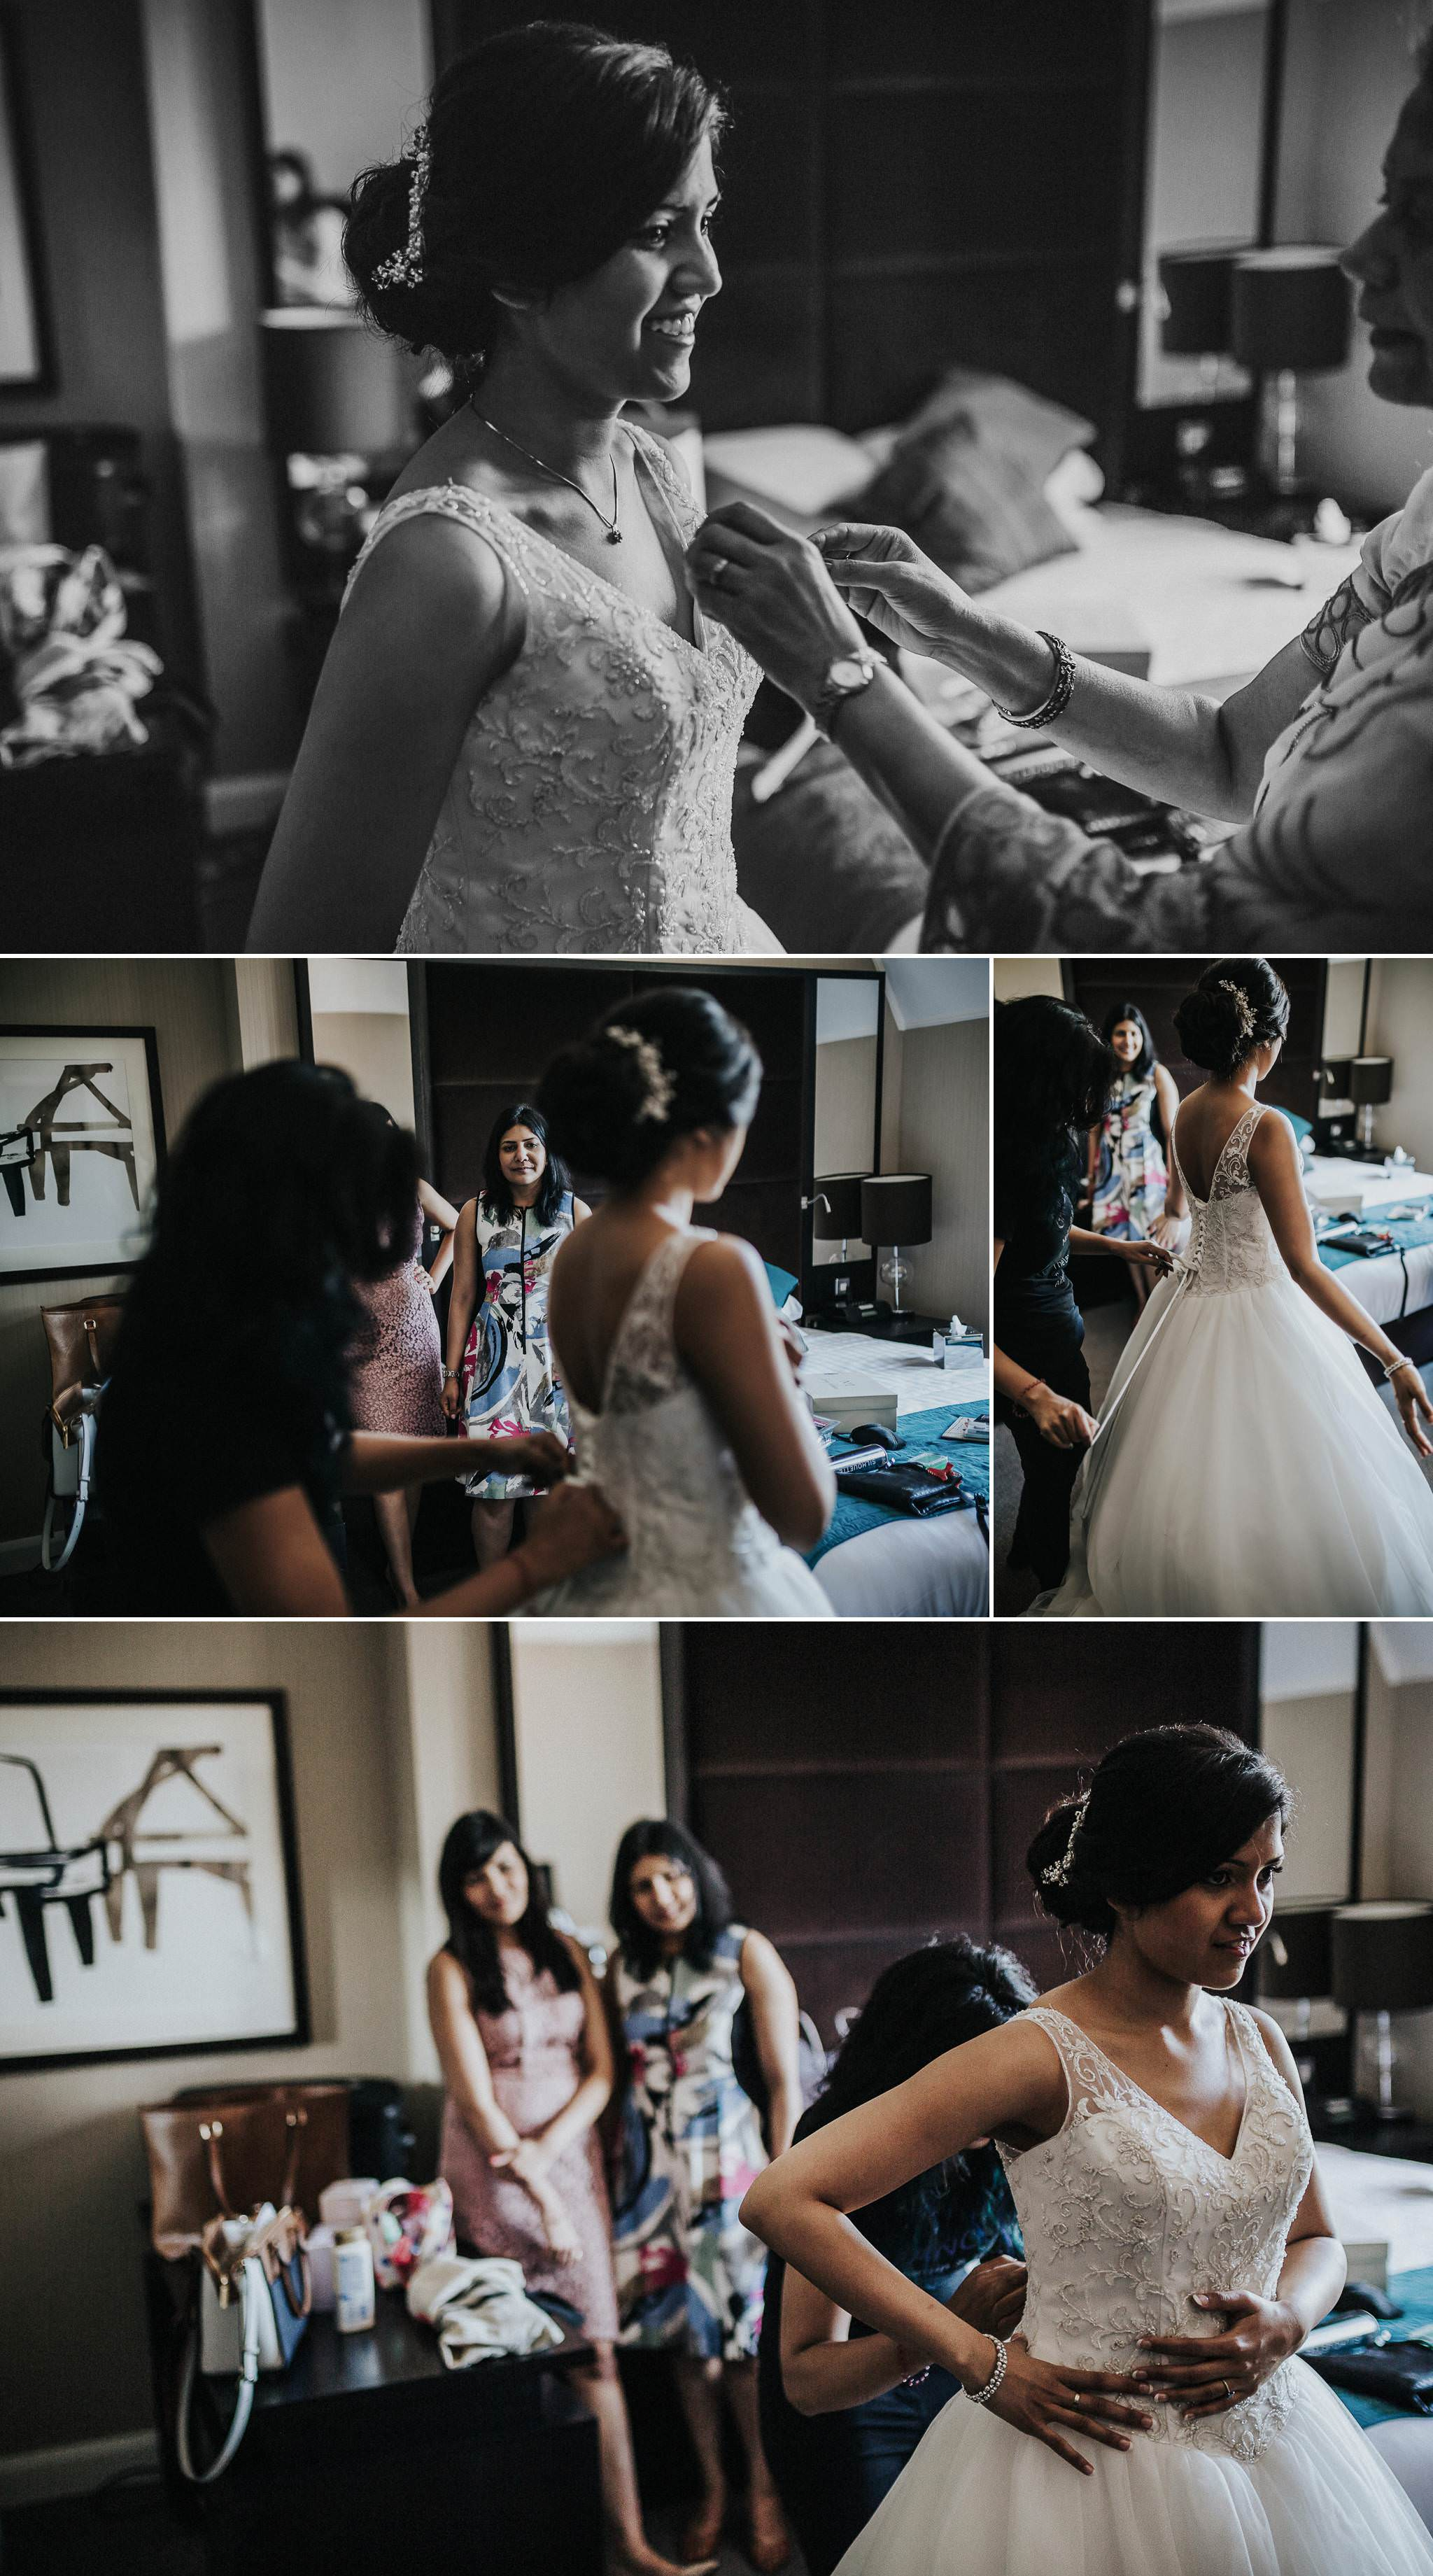 compton-verney-wedding-photos 6.jpg